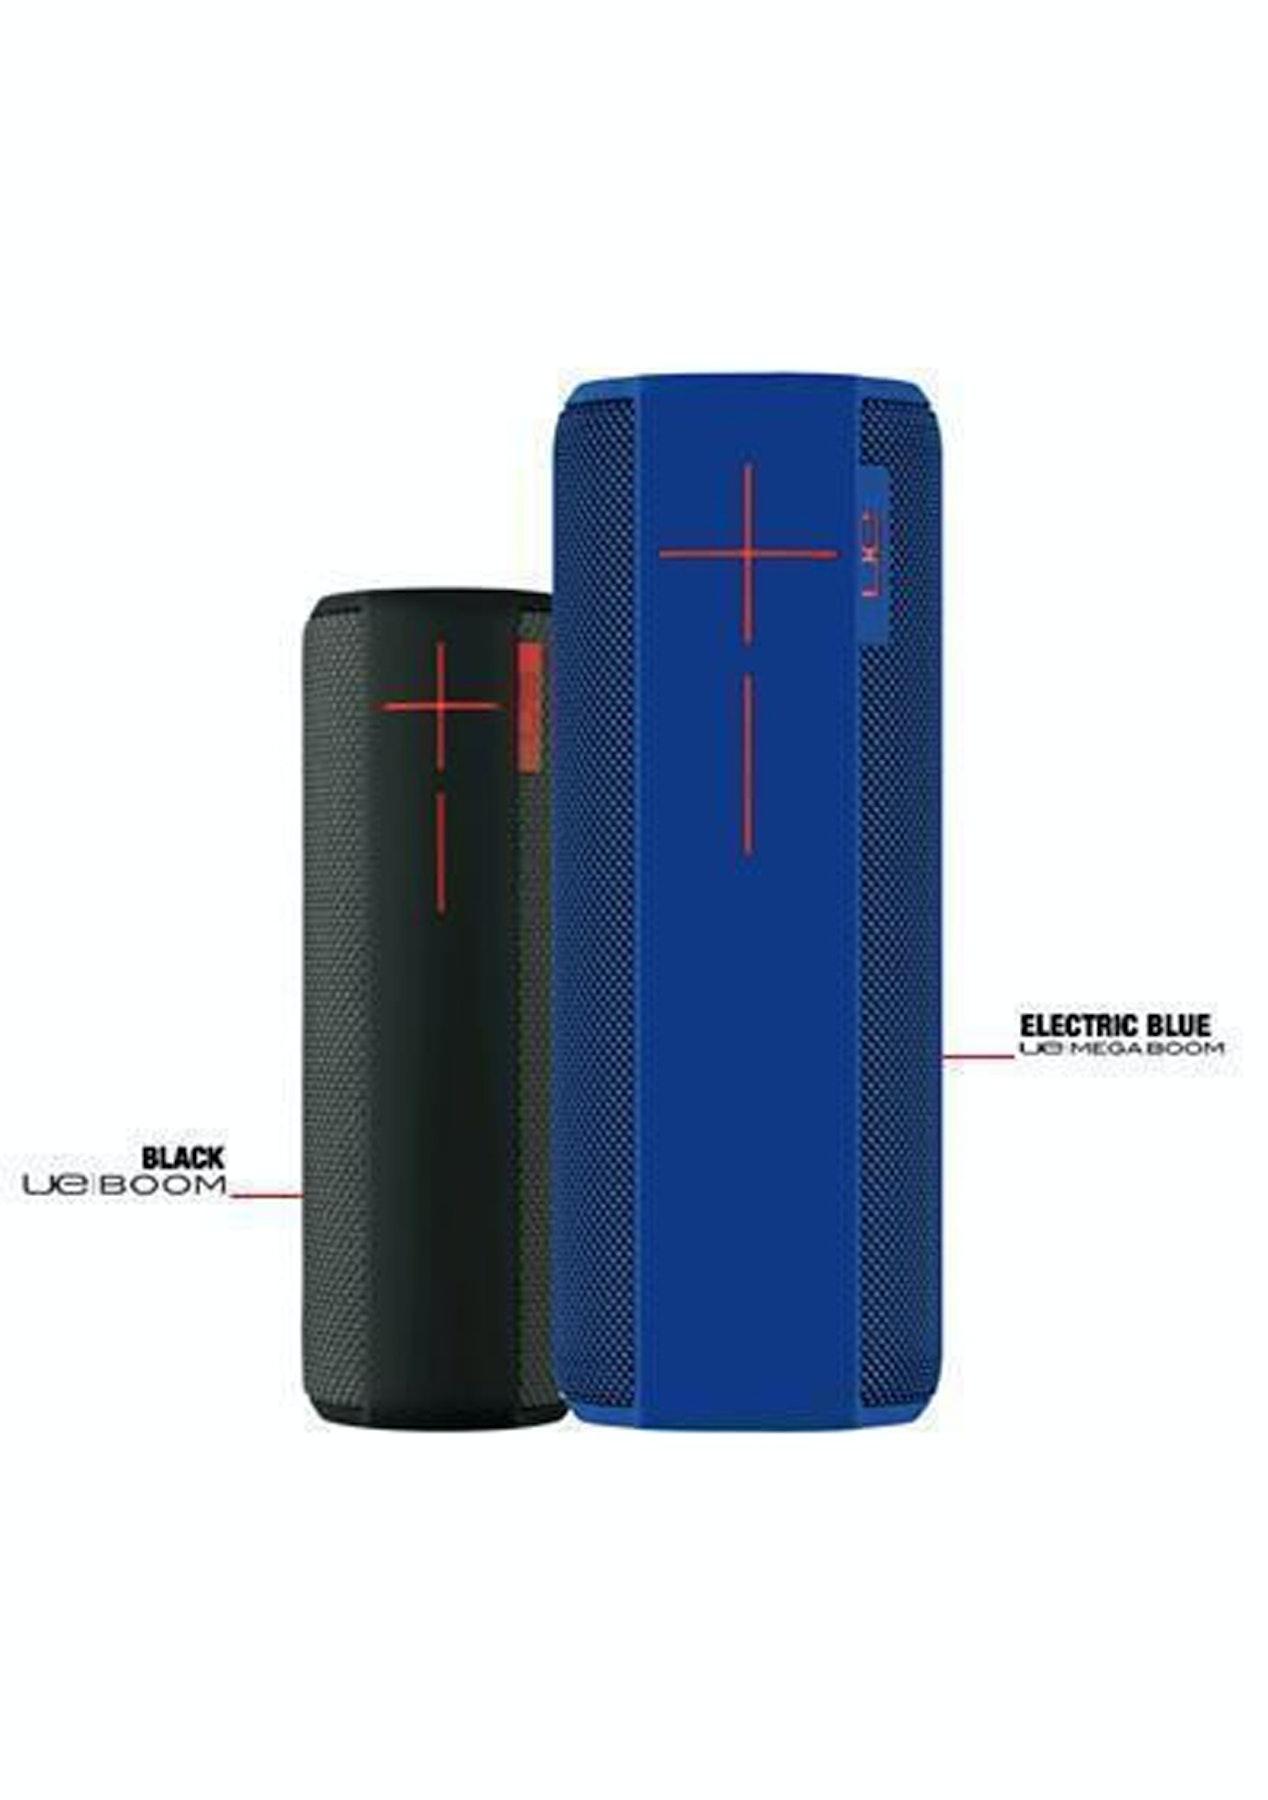 Ultimate Ears UE MEGABOOM Portable Wireless Bluetooth